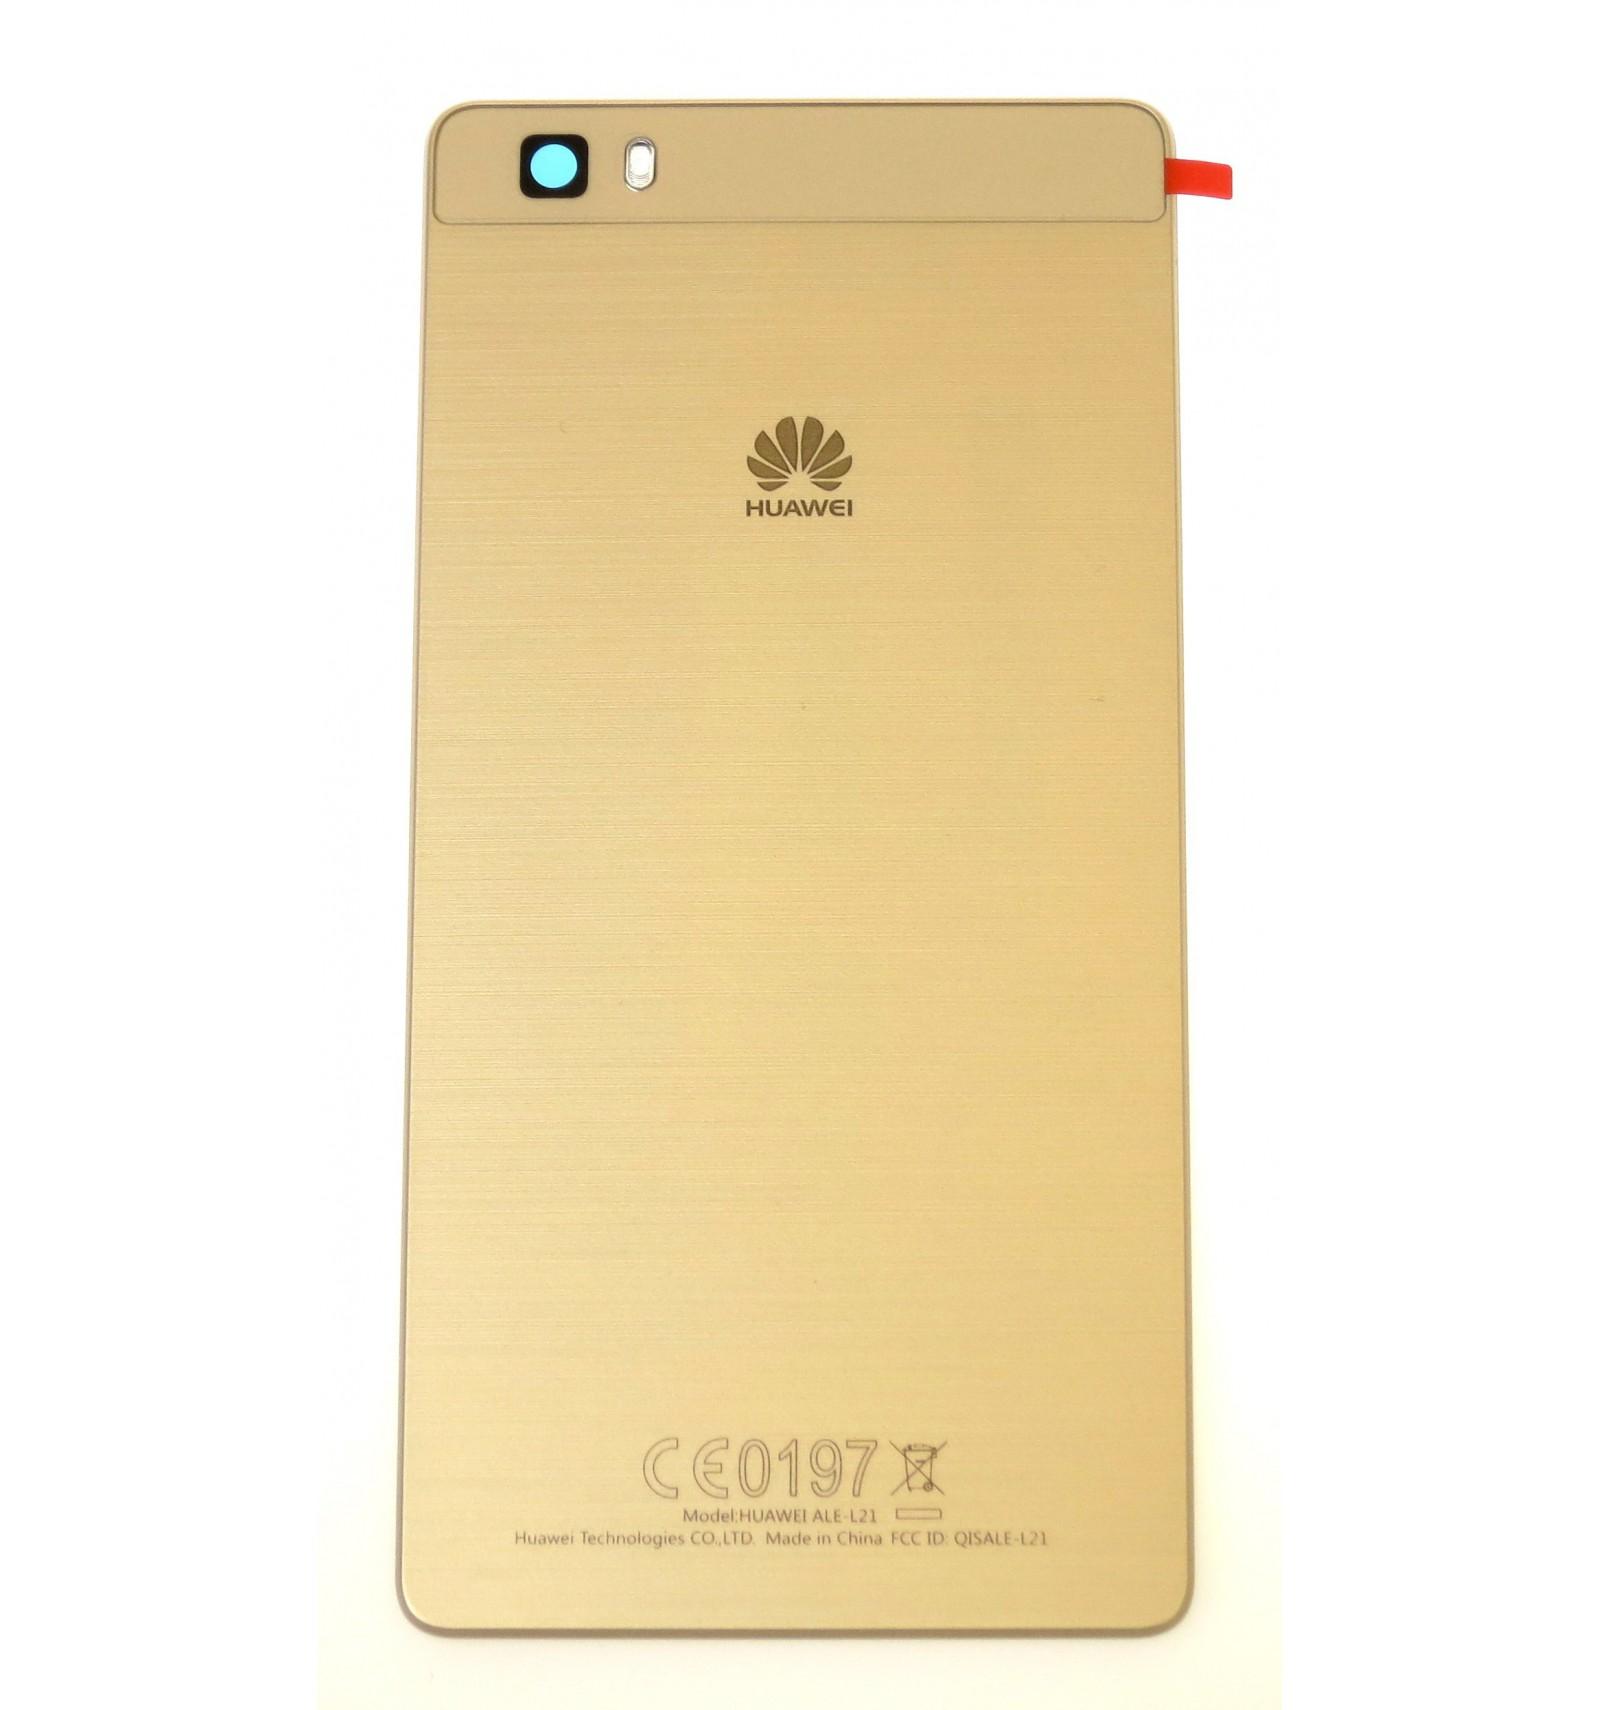 816230    02350HVT Huawei P8 Lite (ALE-L21) - Kryt zadný zlatá - originál df9f69fcee0